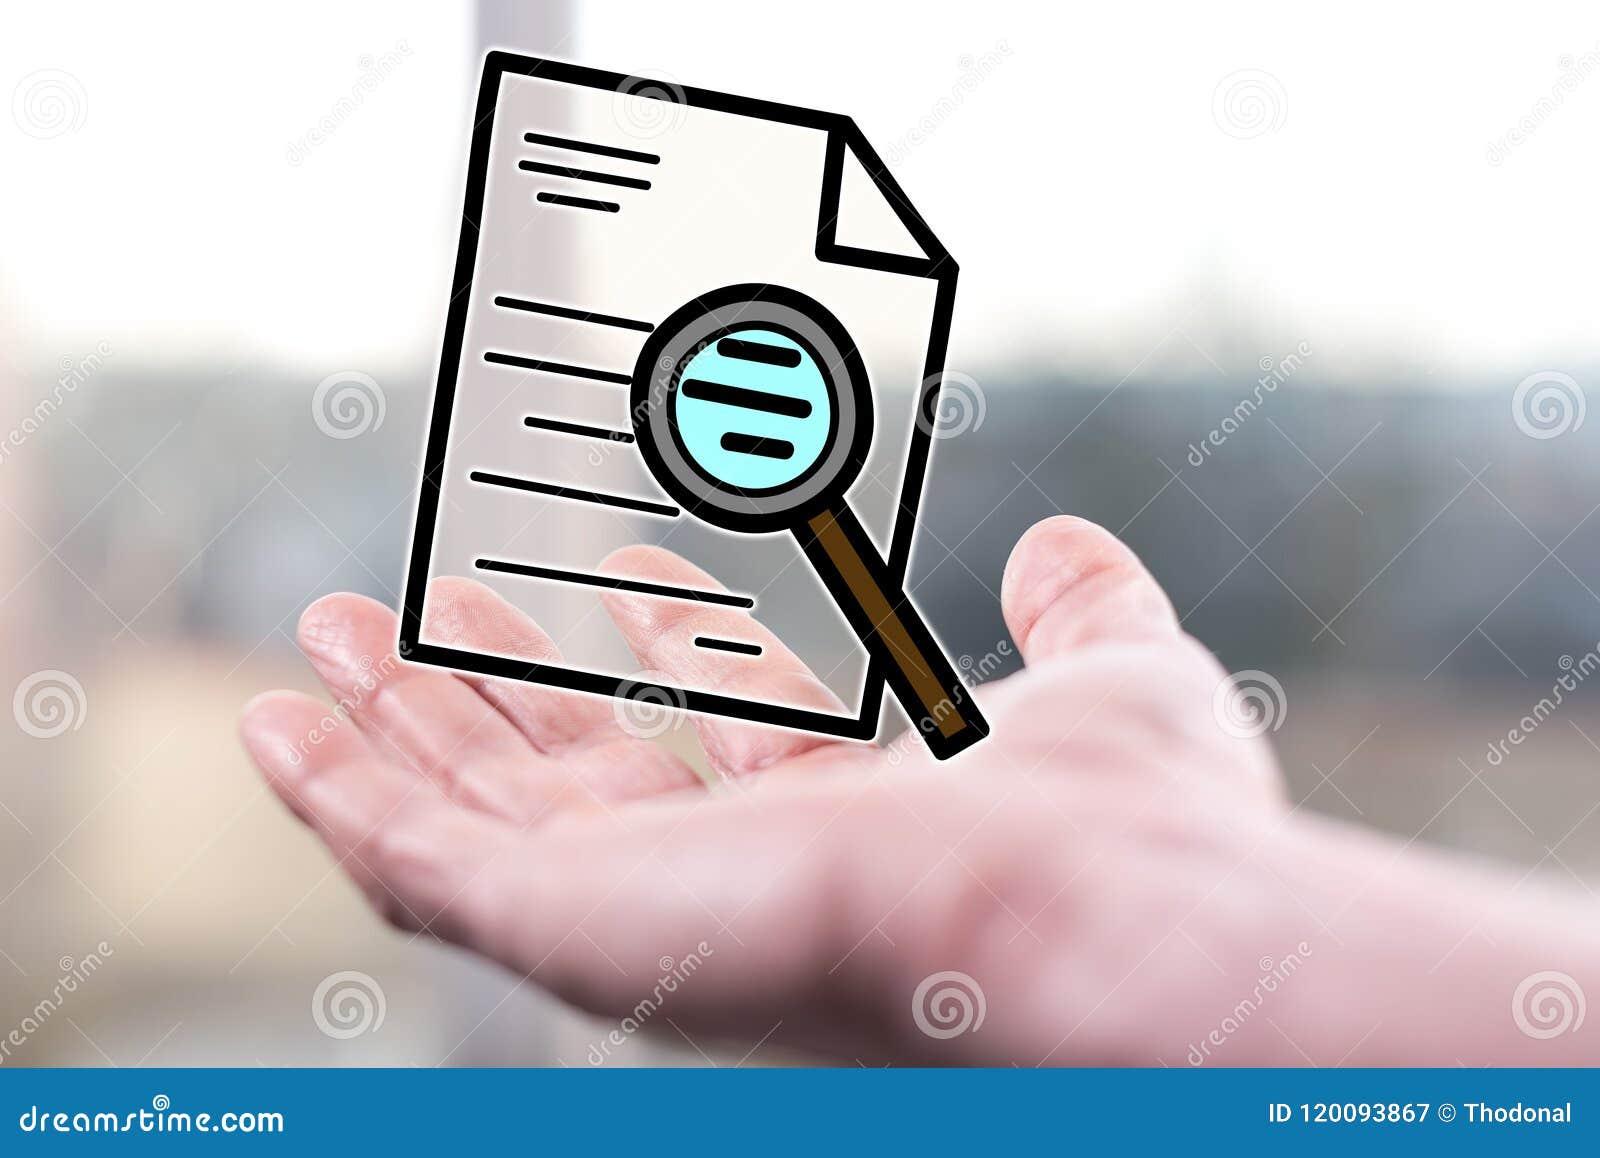 Concept of audit